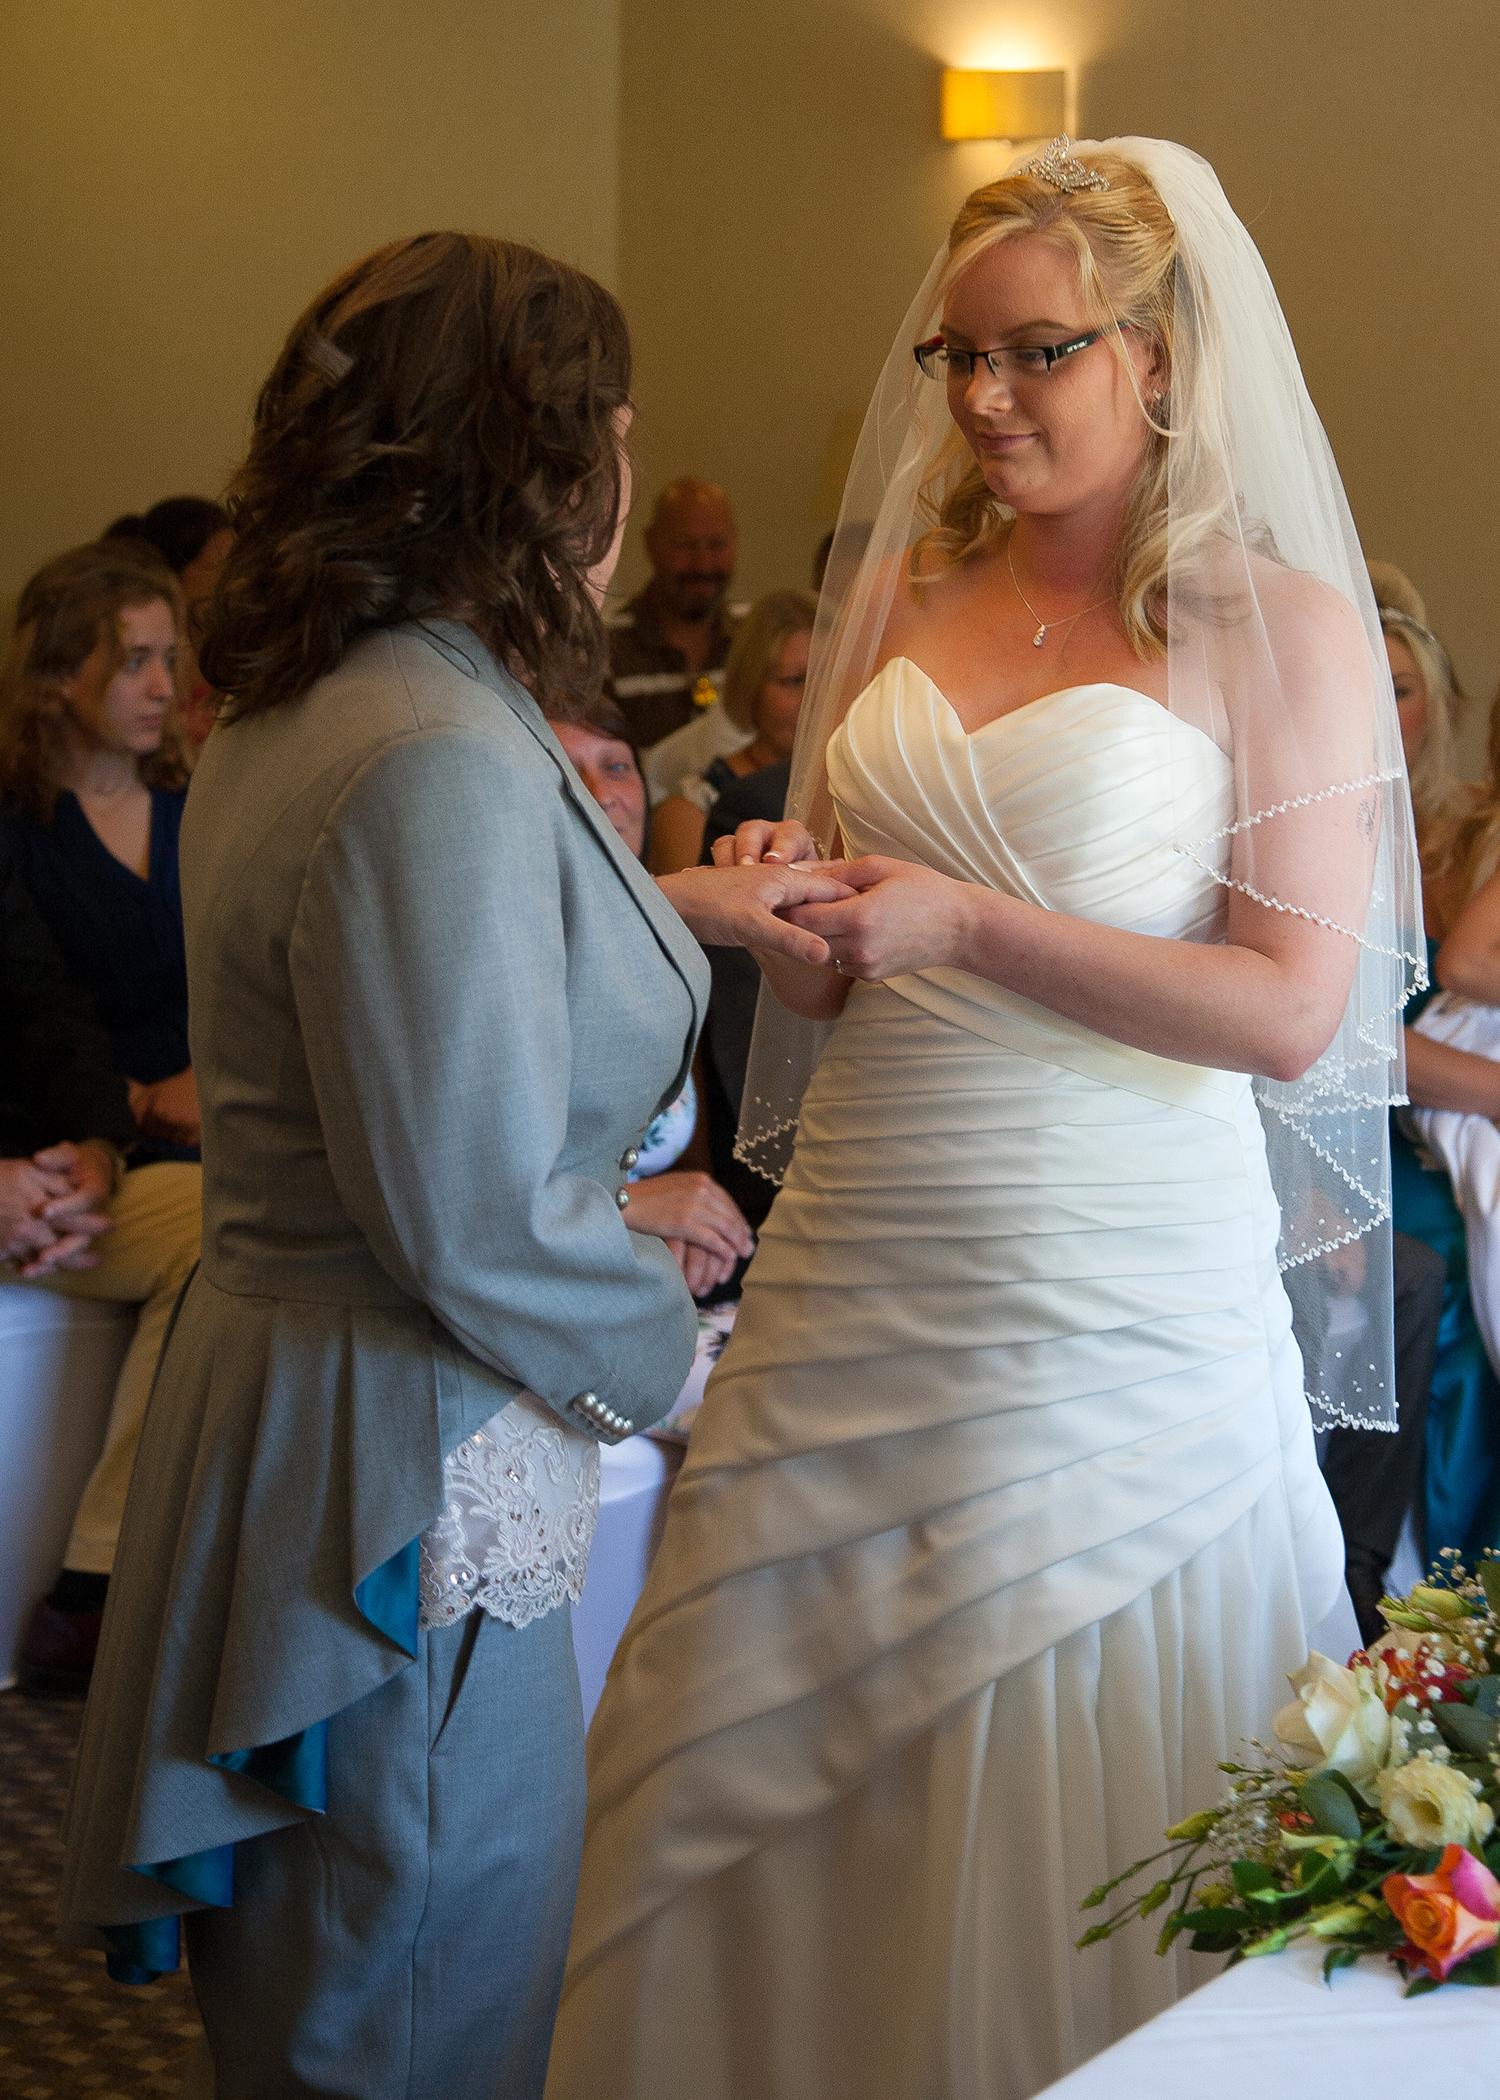 Incredible Lesbian Wedding Suit